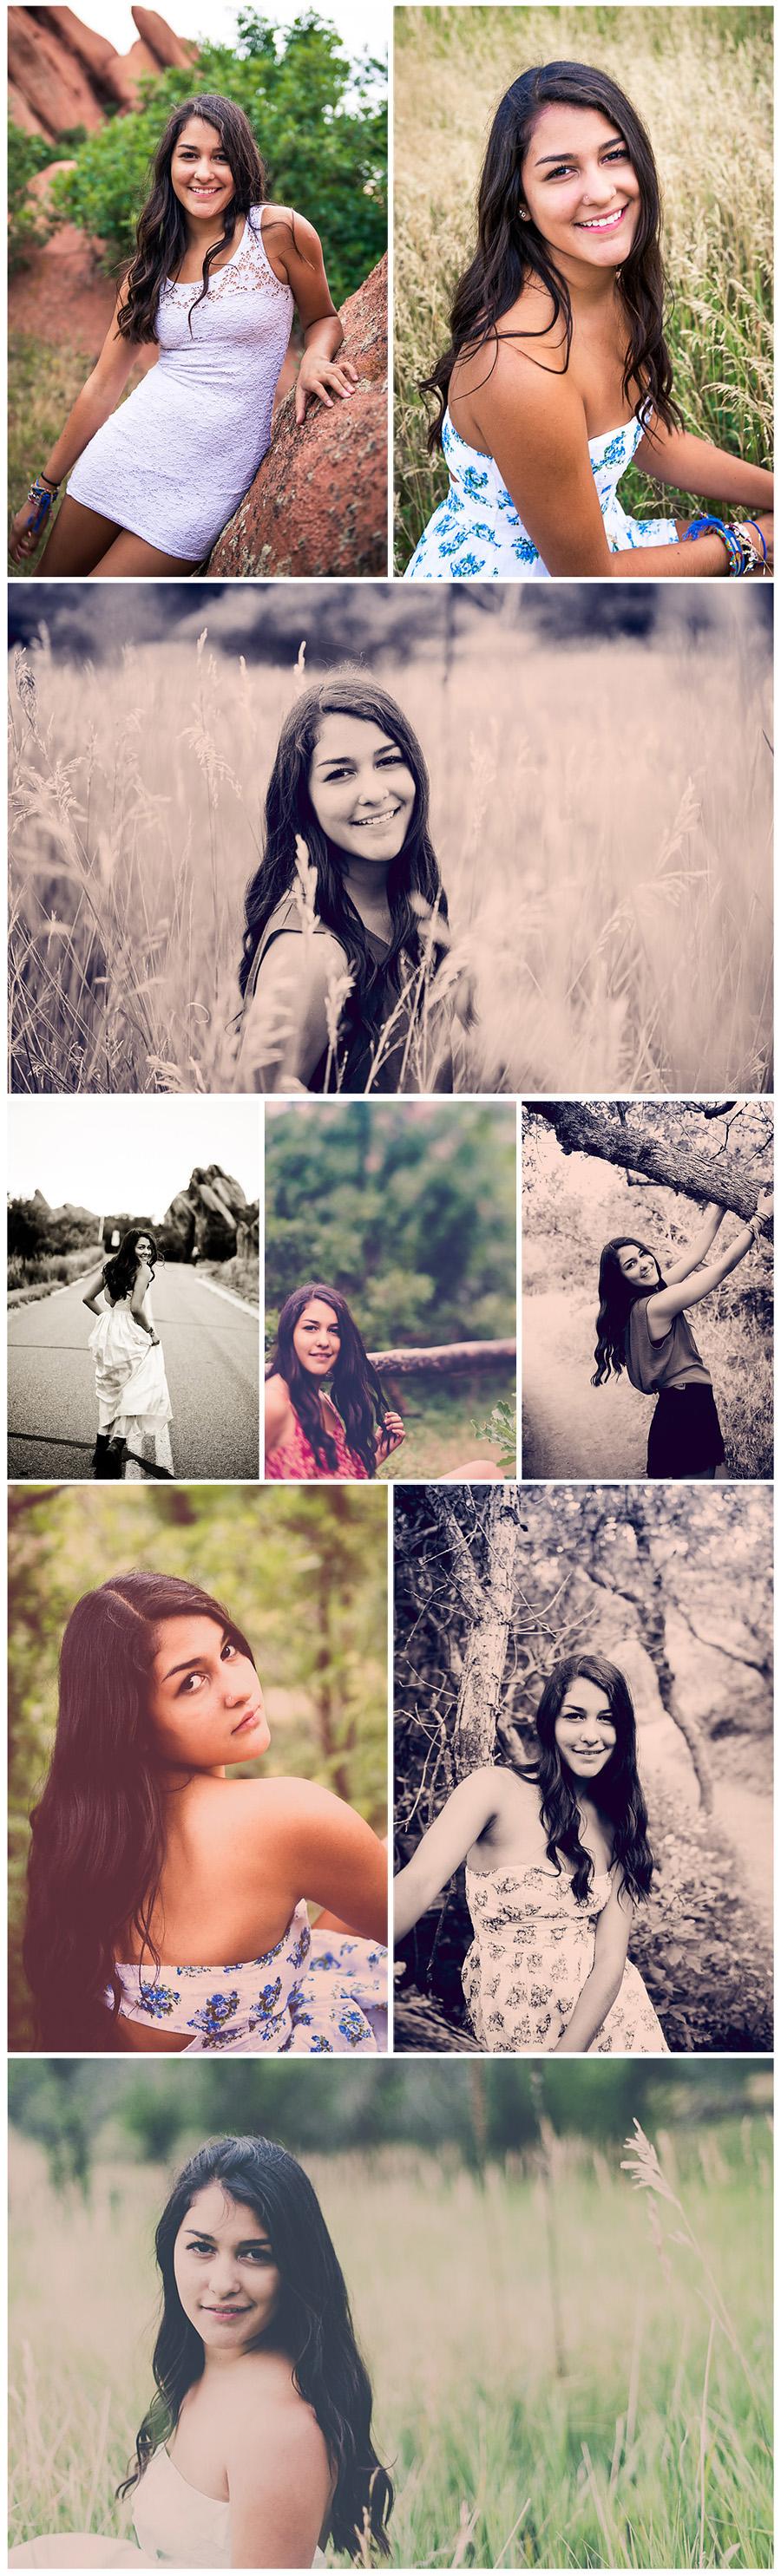 East High School Senior Pictures Jasmine Collage 1